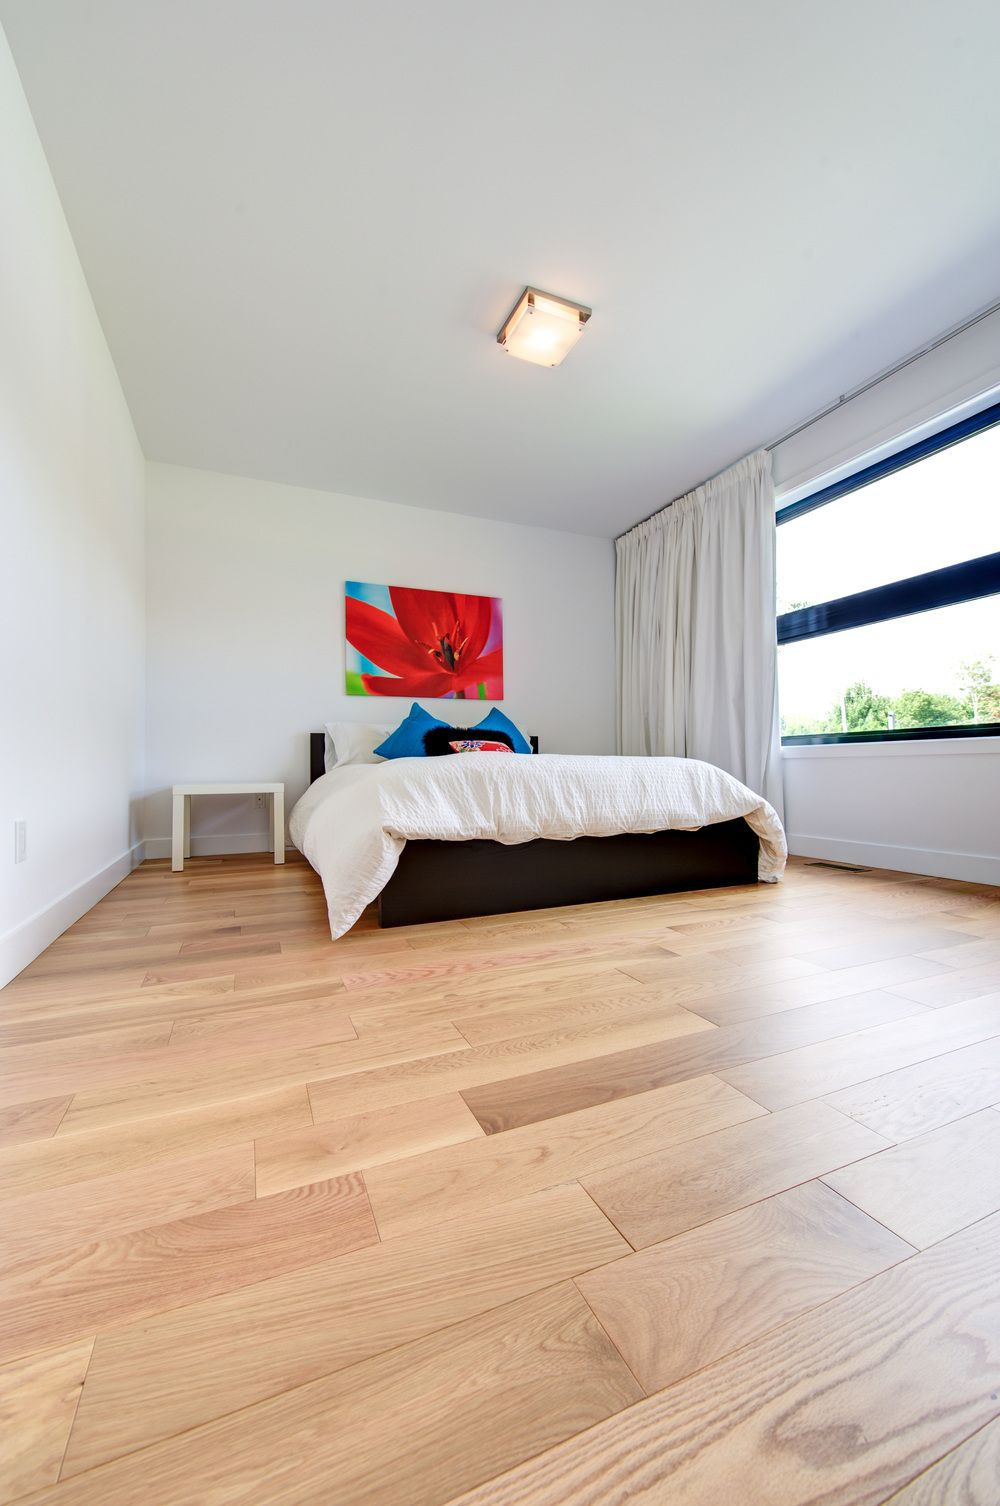 Wide plank red oak floor bedroom Red Oak Flooring for